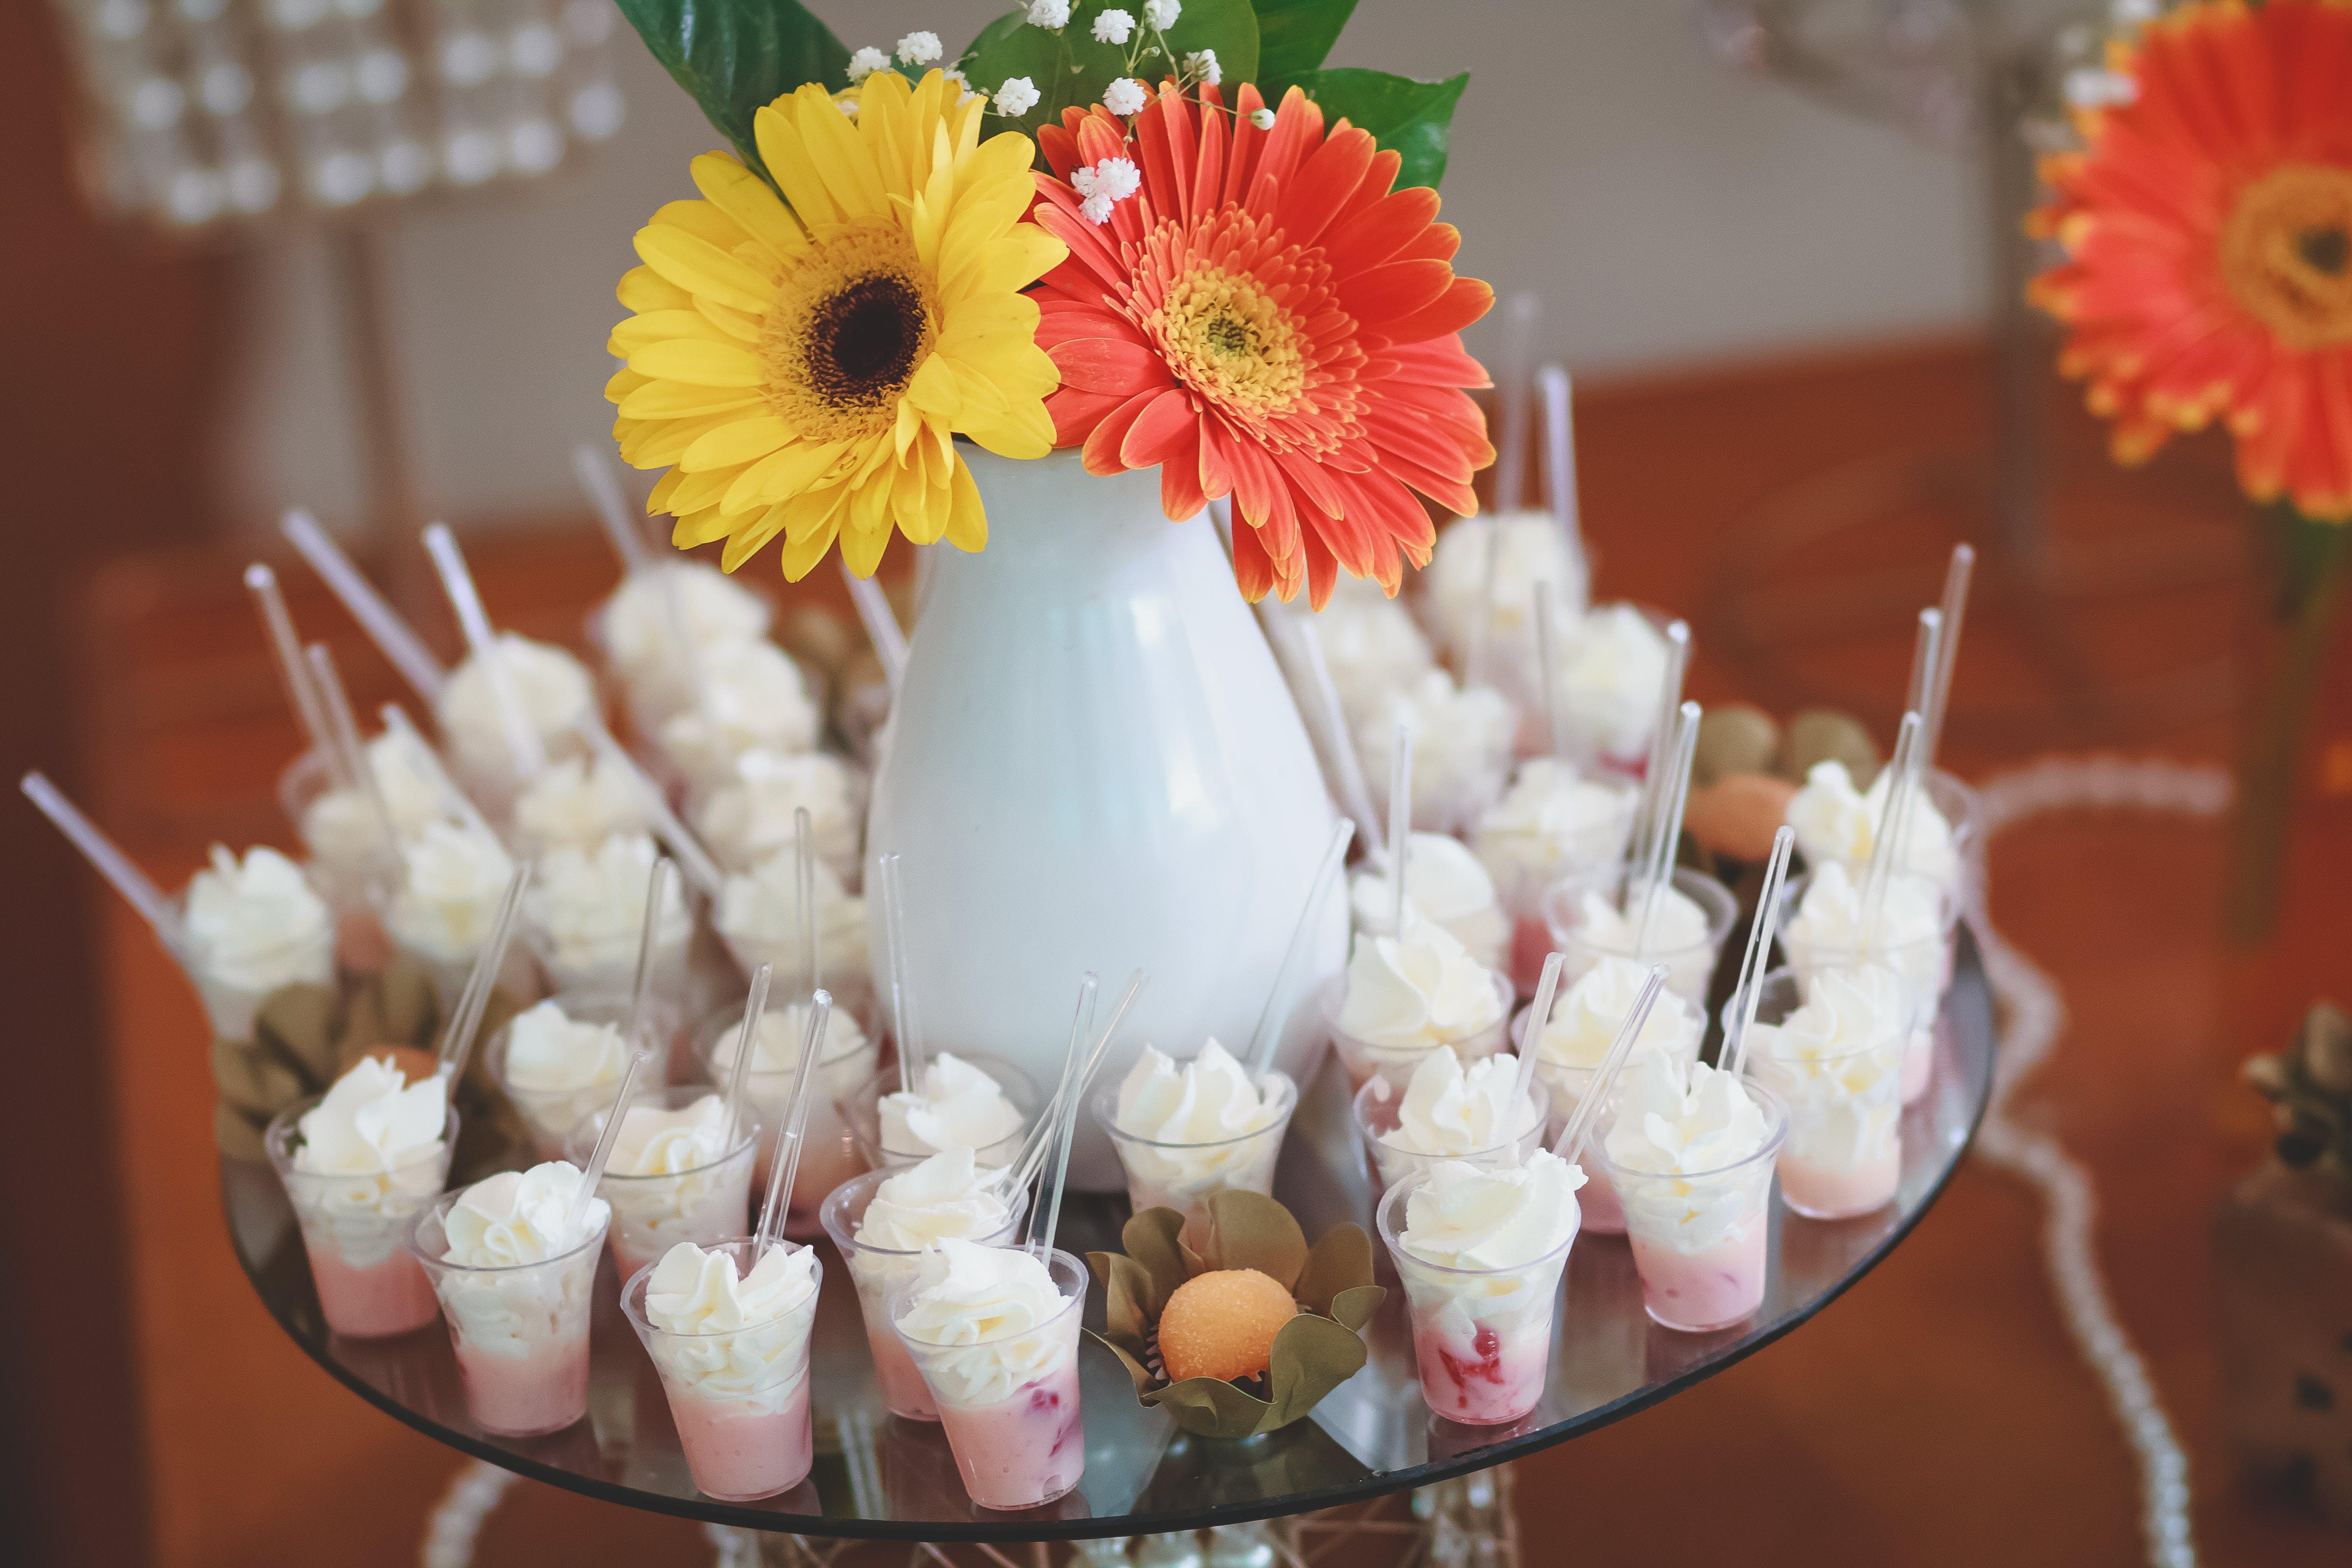 Free stock photo of blooms, candies, celebration, flower arrangement